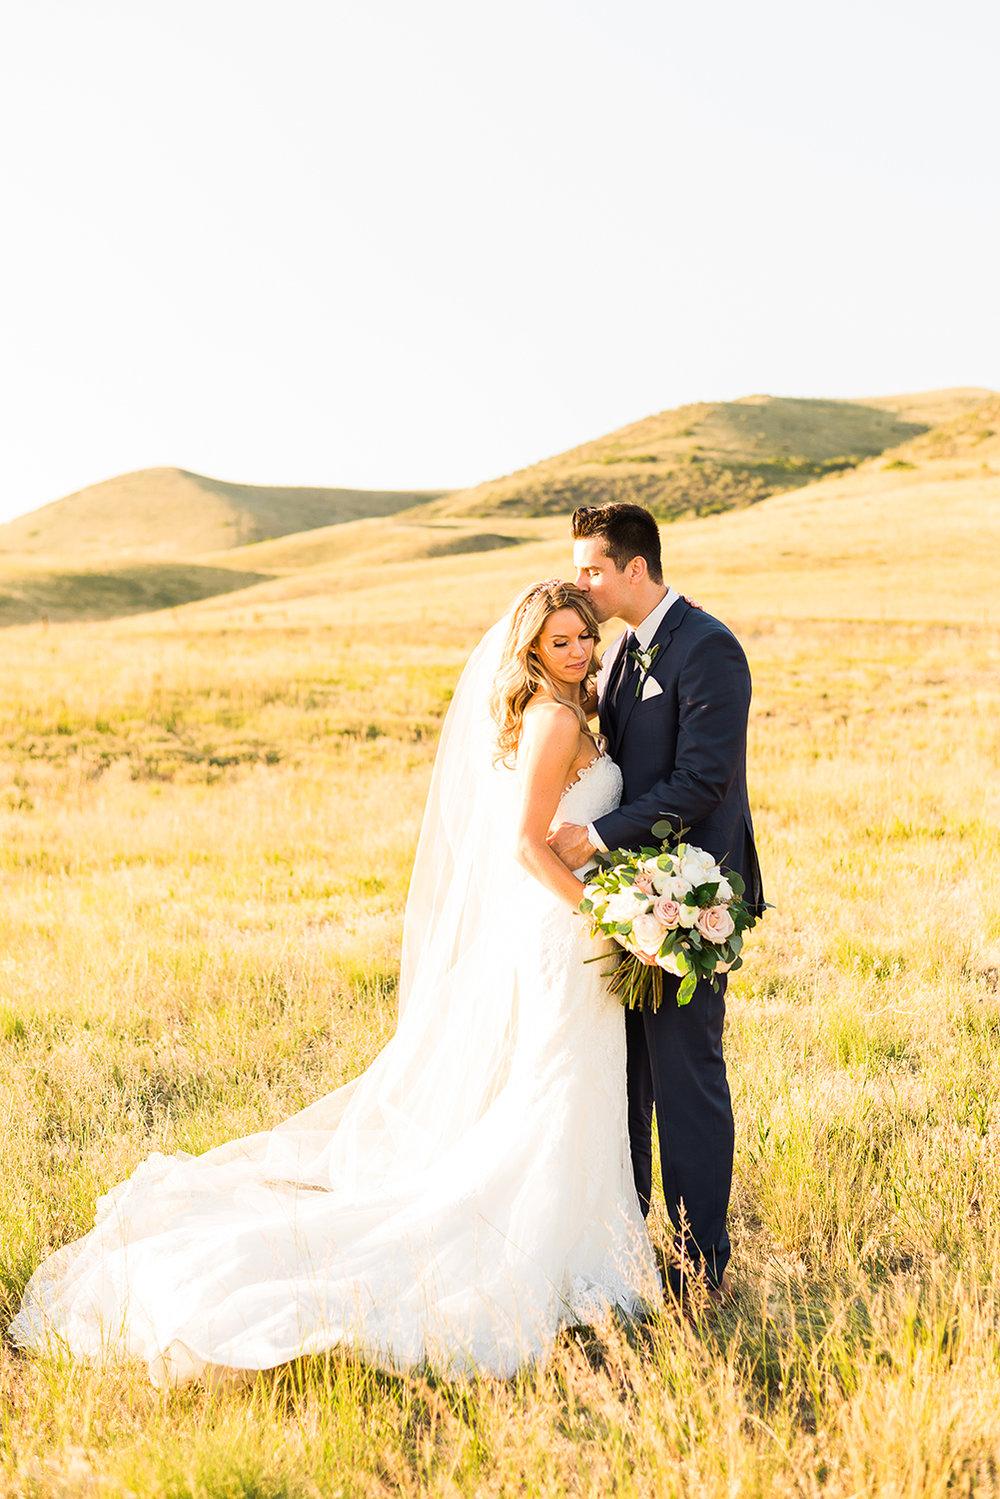 The-Retreat-At-Solterra-Wedding-Denver-Wedding-Photographer-45.jpg